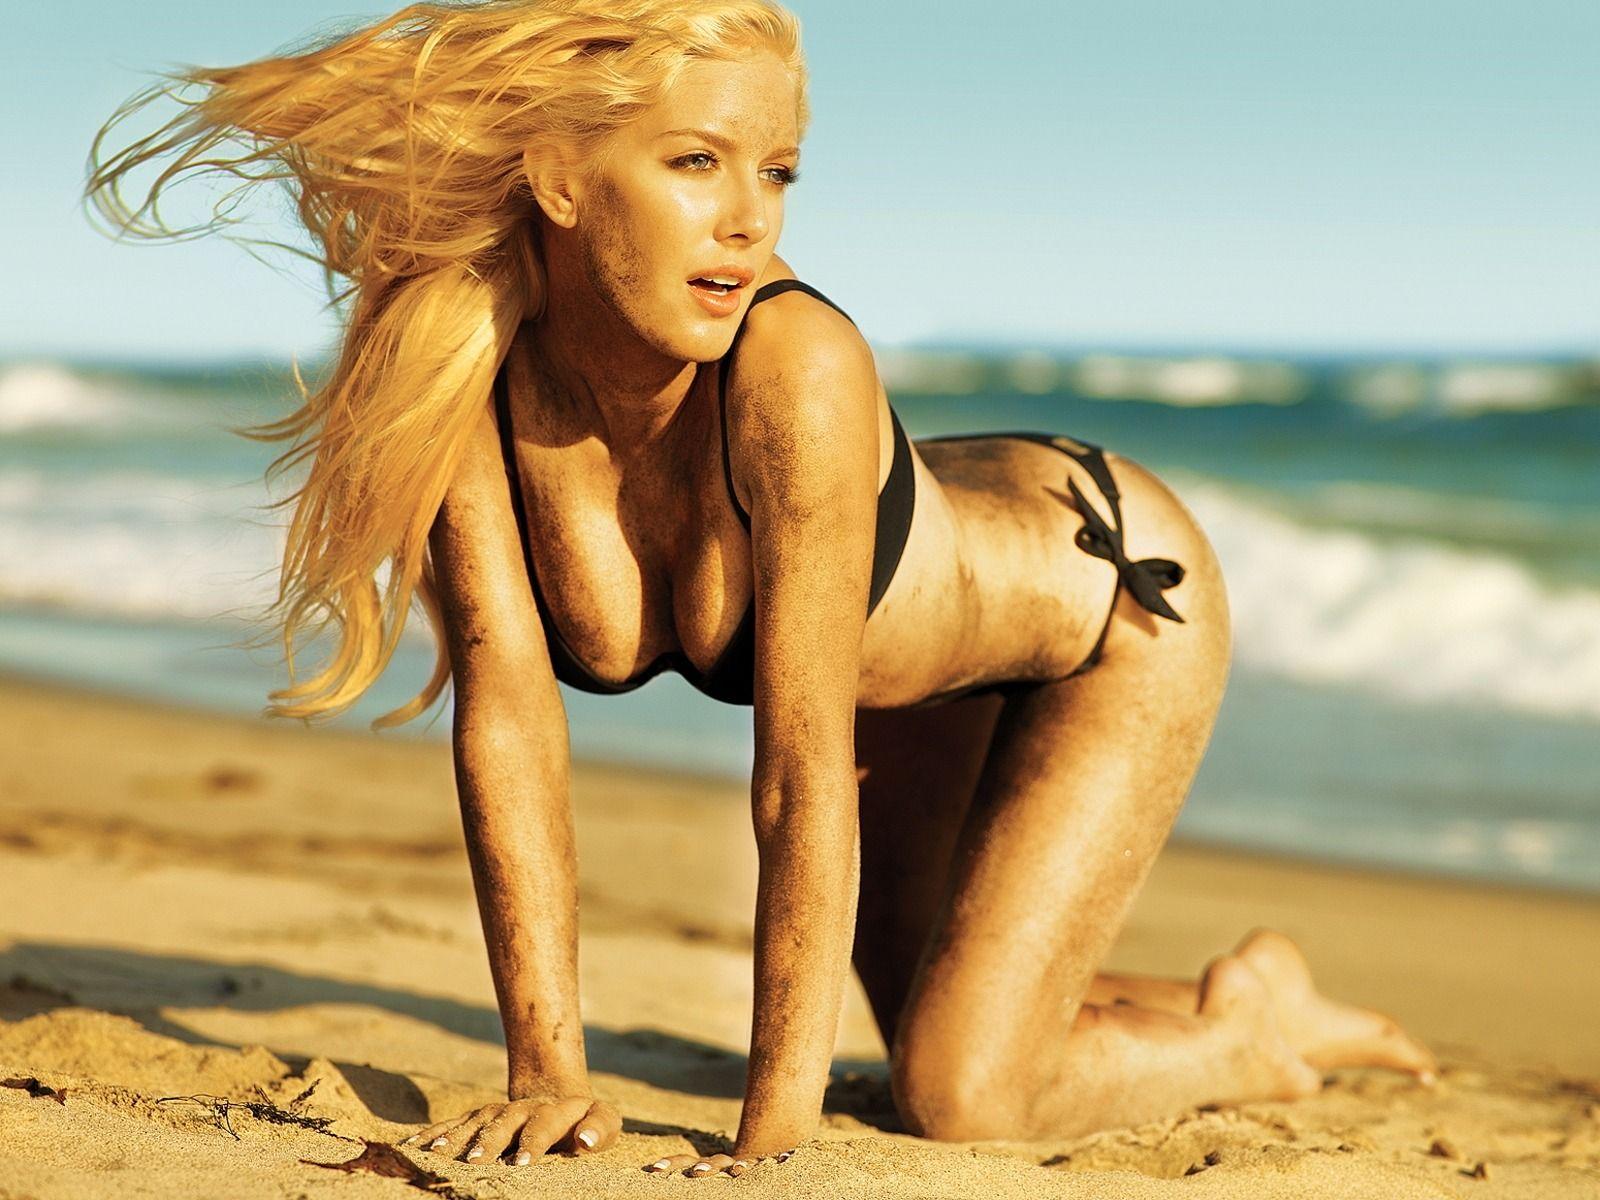 naked-girl-play-boy-vagiina-nude-seductive-kiss